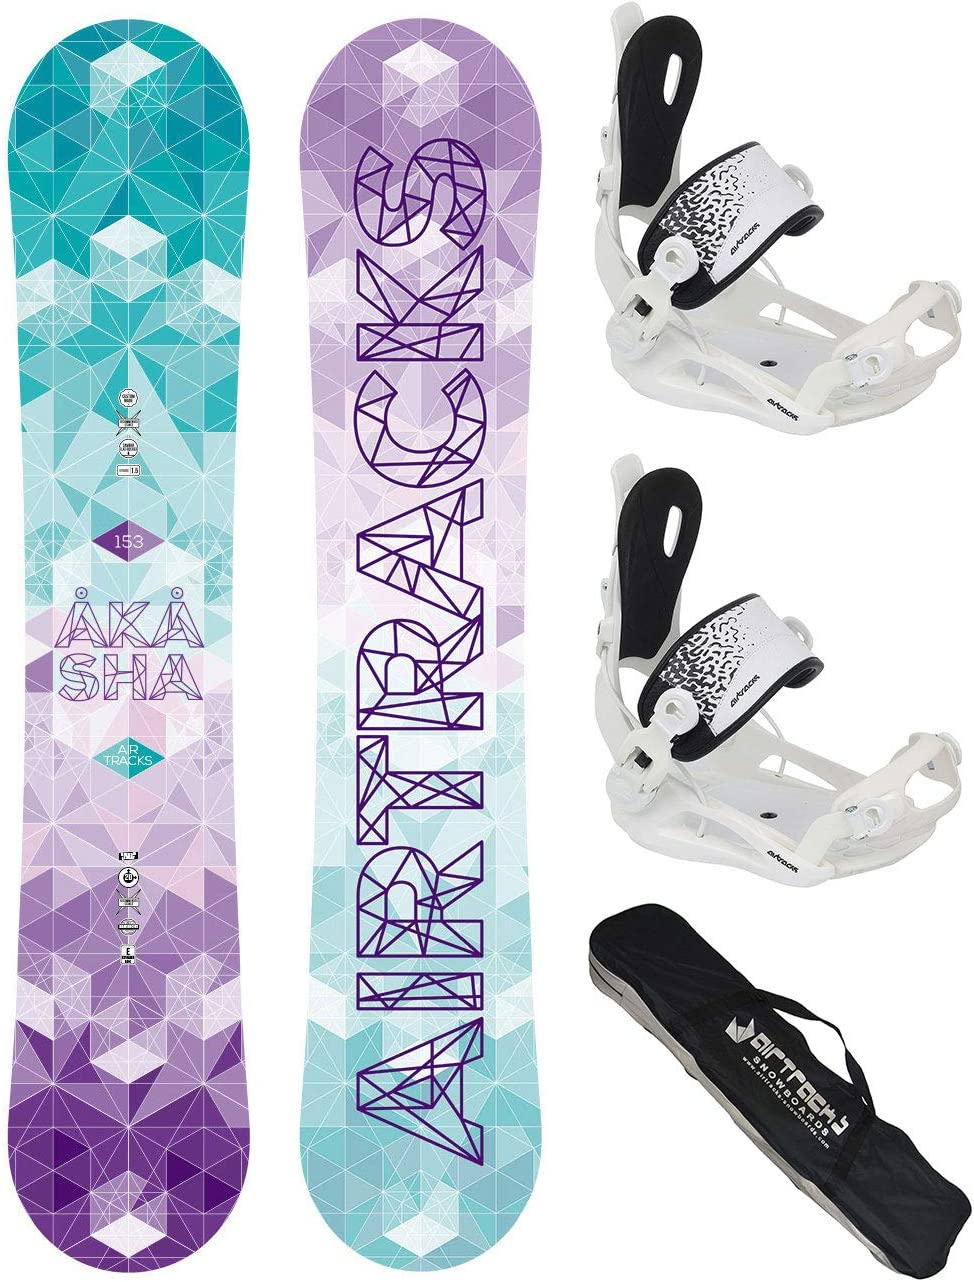 Boots Airtracks Snowboard KOMPLETT Set//Fantasy Carbon Snowboard Wide Flat Rocker SB Bag // 148 153 158 // cm BINDUNG Master FASTEC